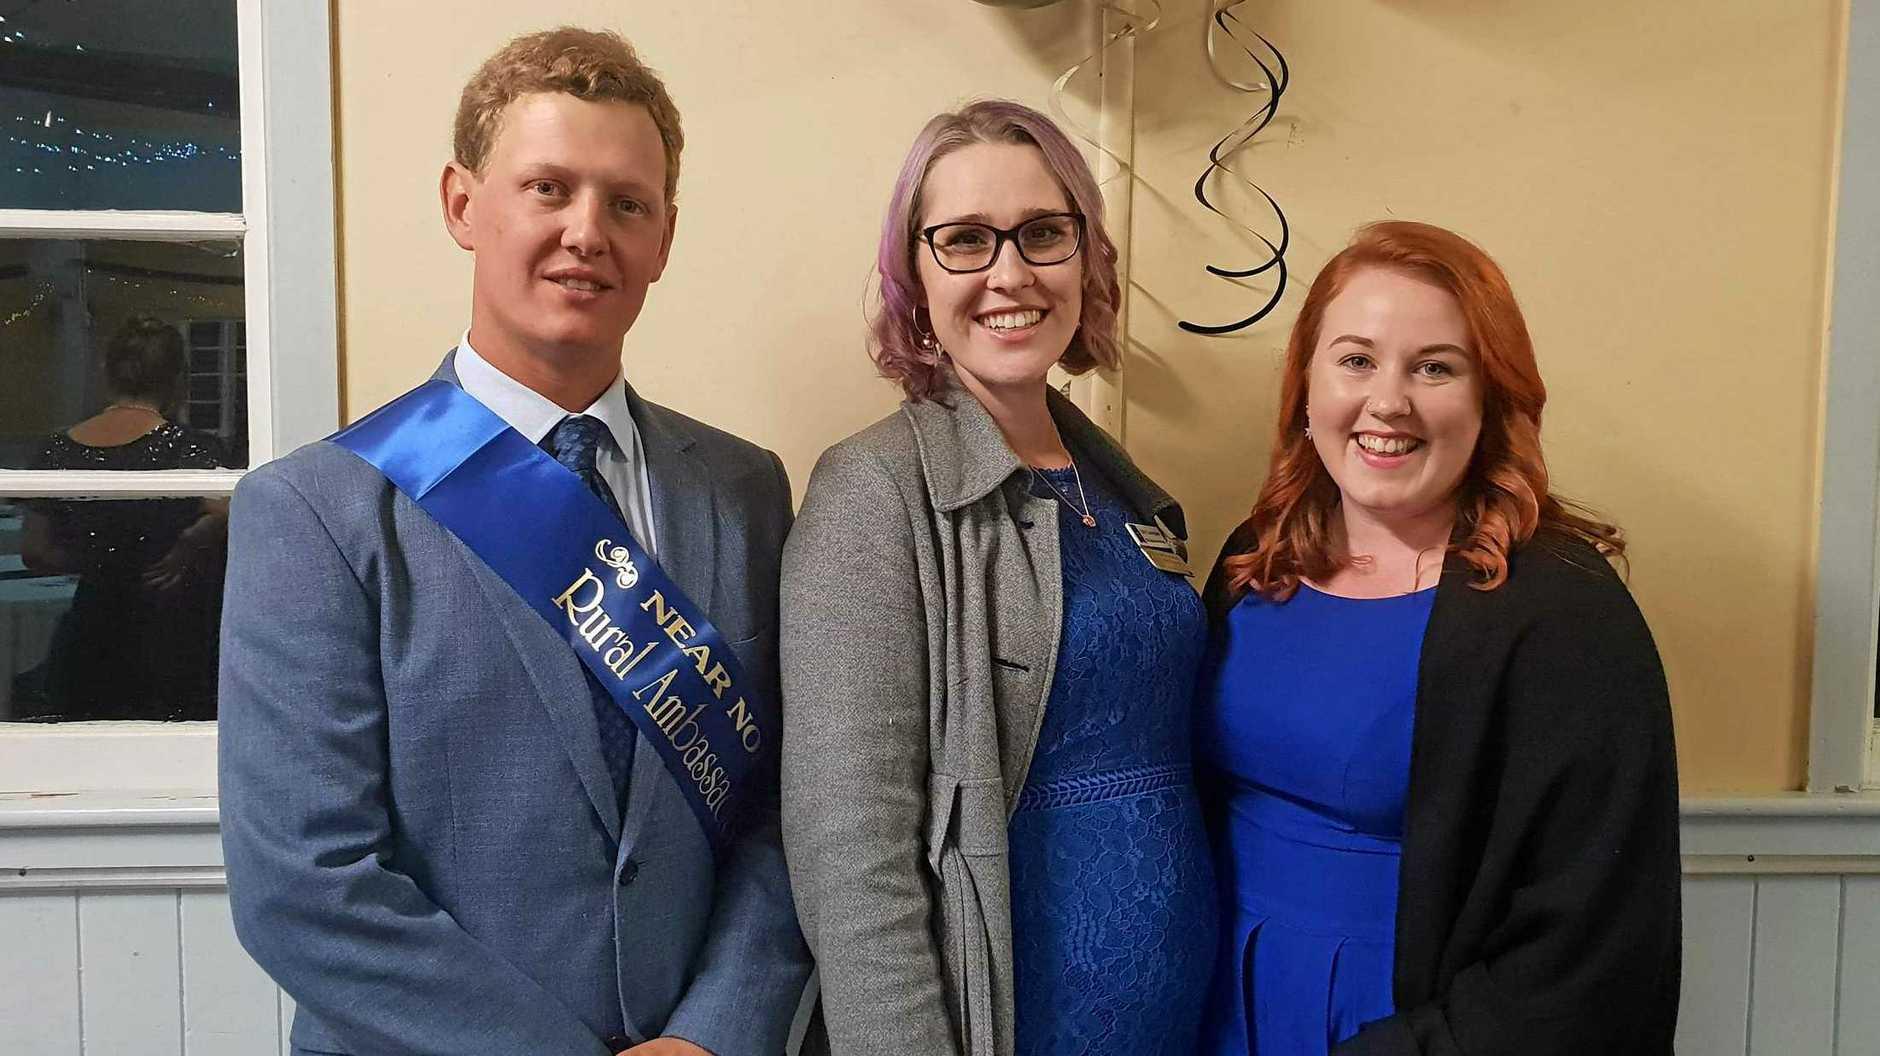 2019 Near North Coast Rural Ambassador Myles Newcombe with 2018 Rural Ambassador Emily Larkin and 2017 Rural Ambassador Mikaela Calvert at Kenilworth on Saturday night.